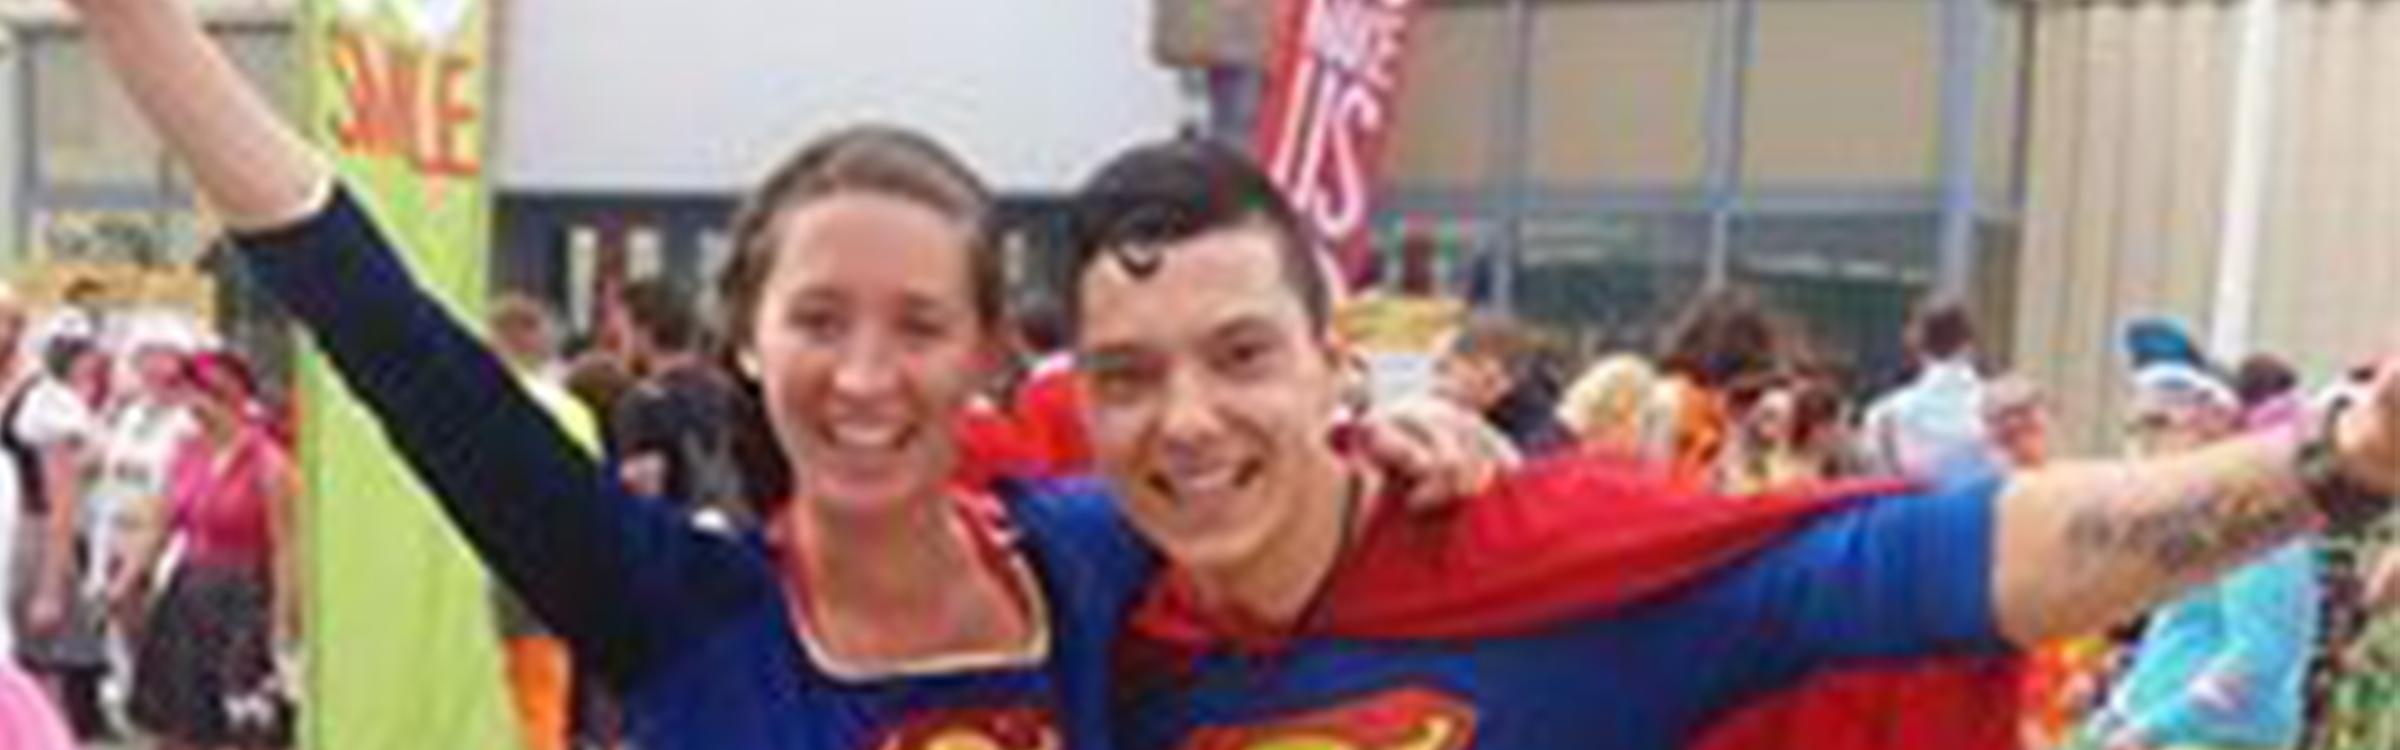 Supermanheaderdef